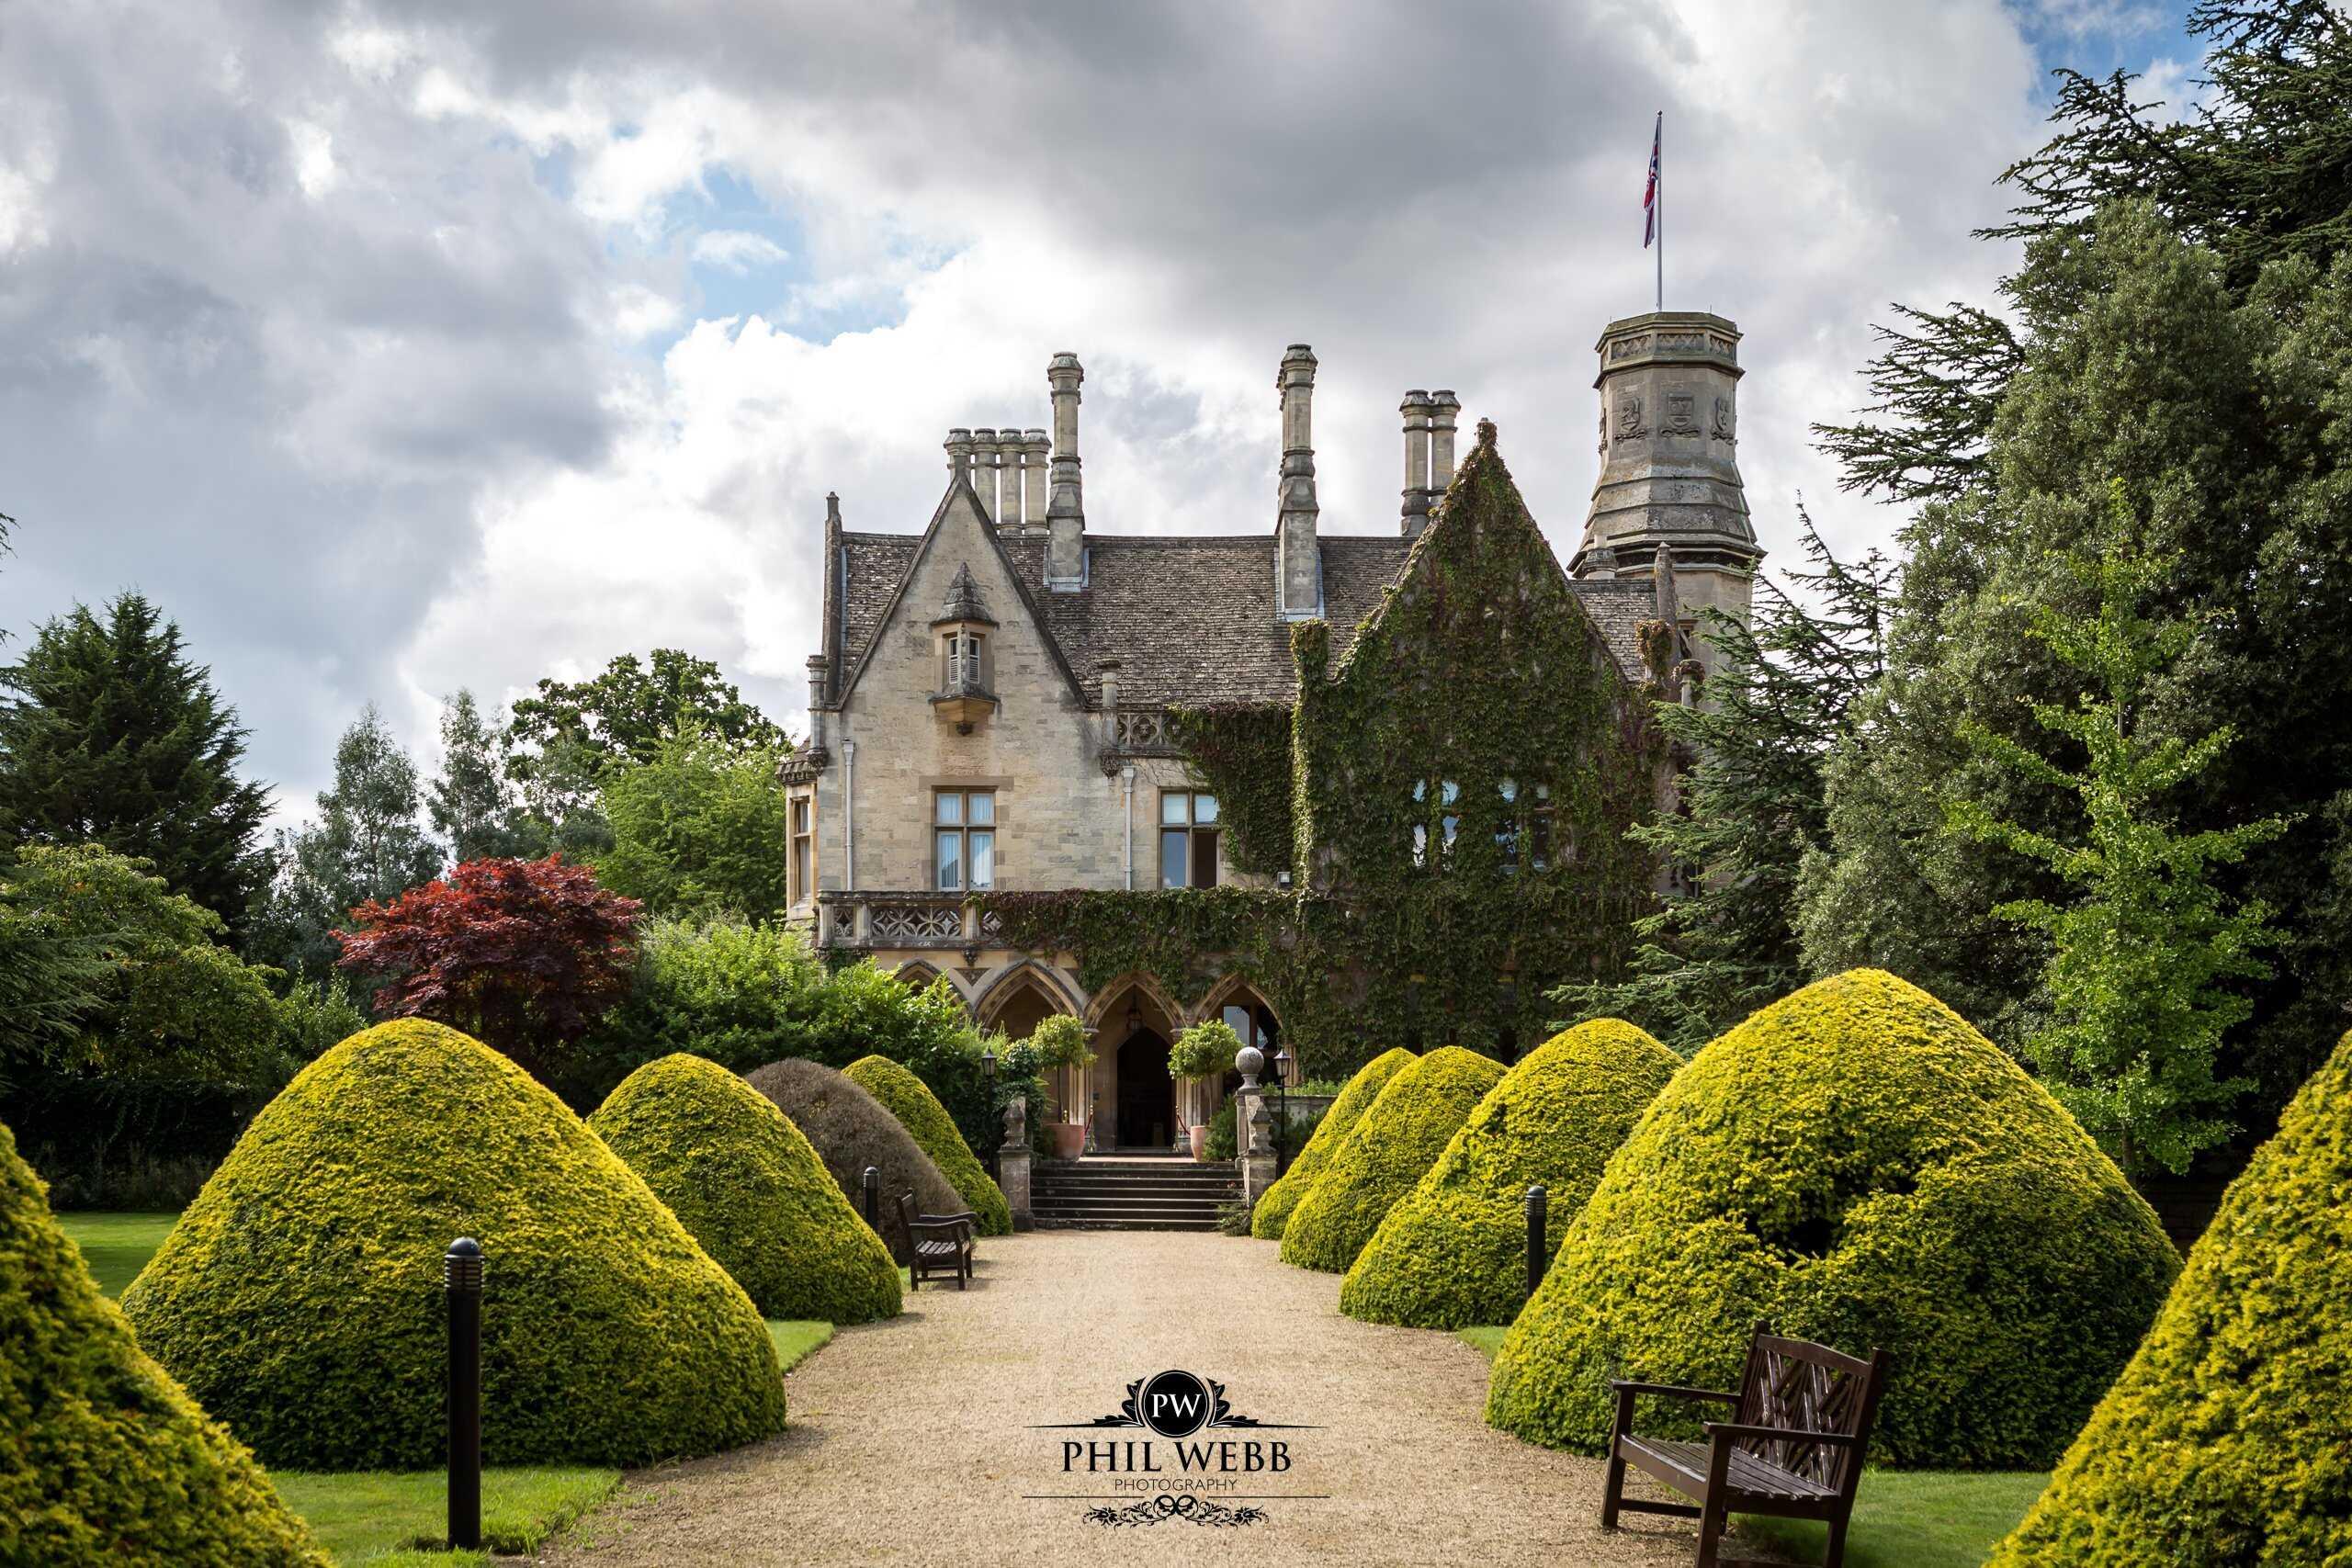 Coming soon, Hattie & Darren's Wedding - Manor by the Lake